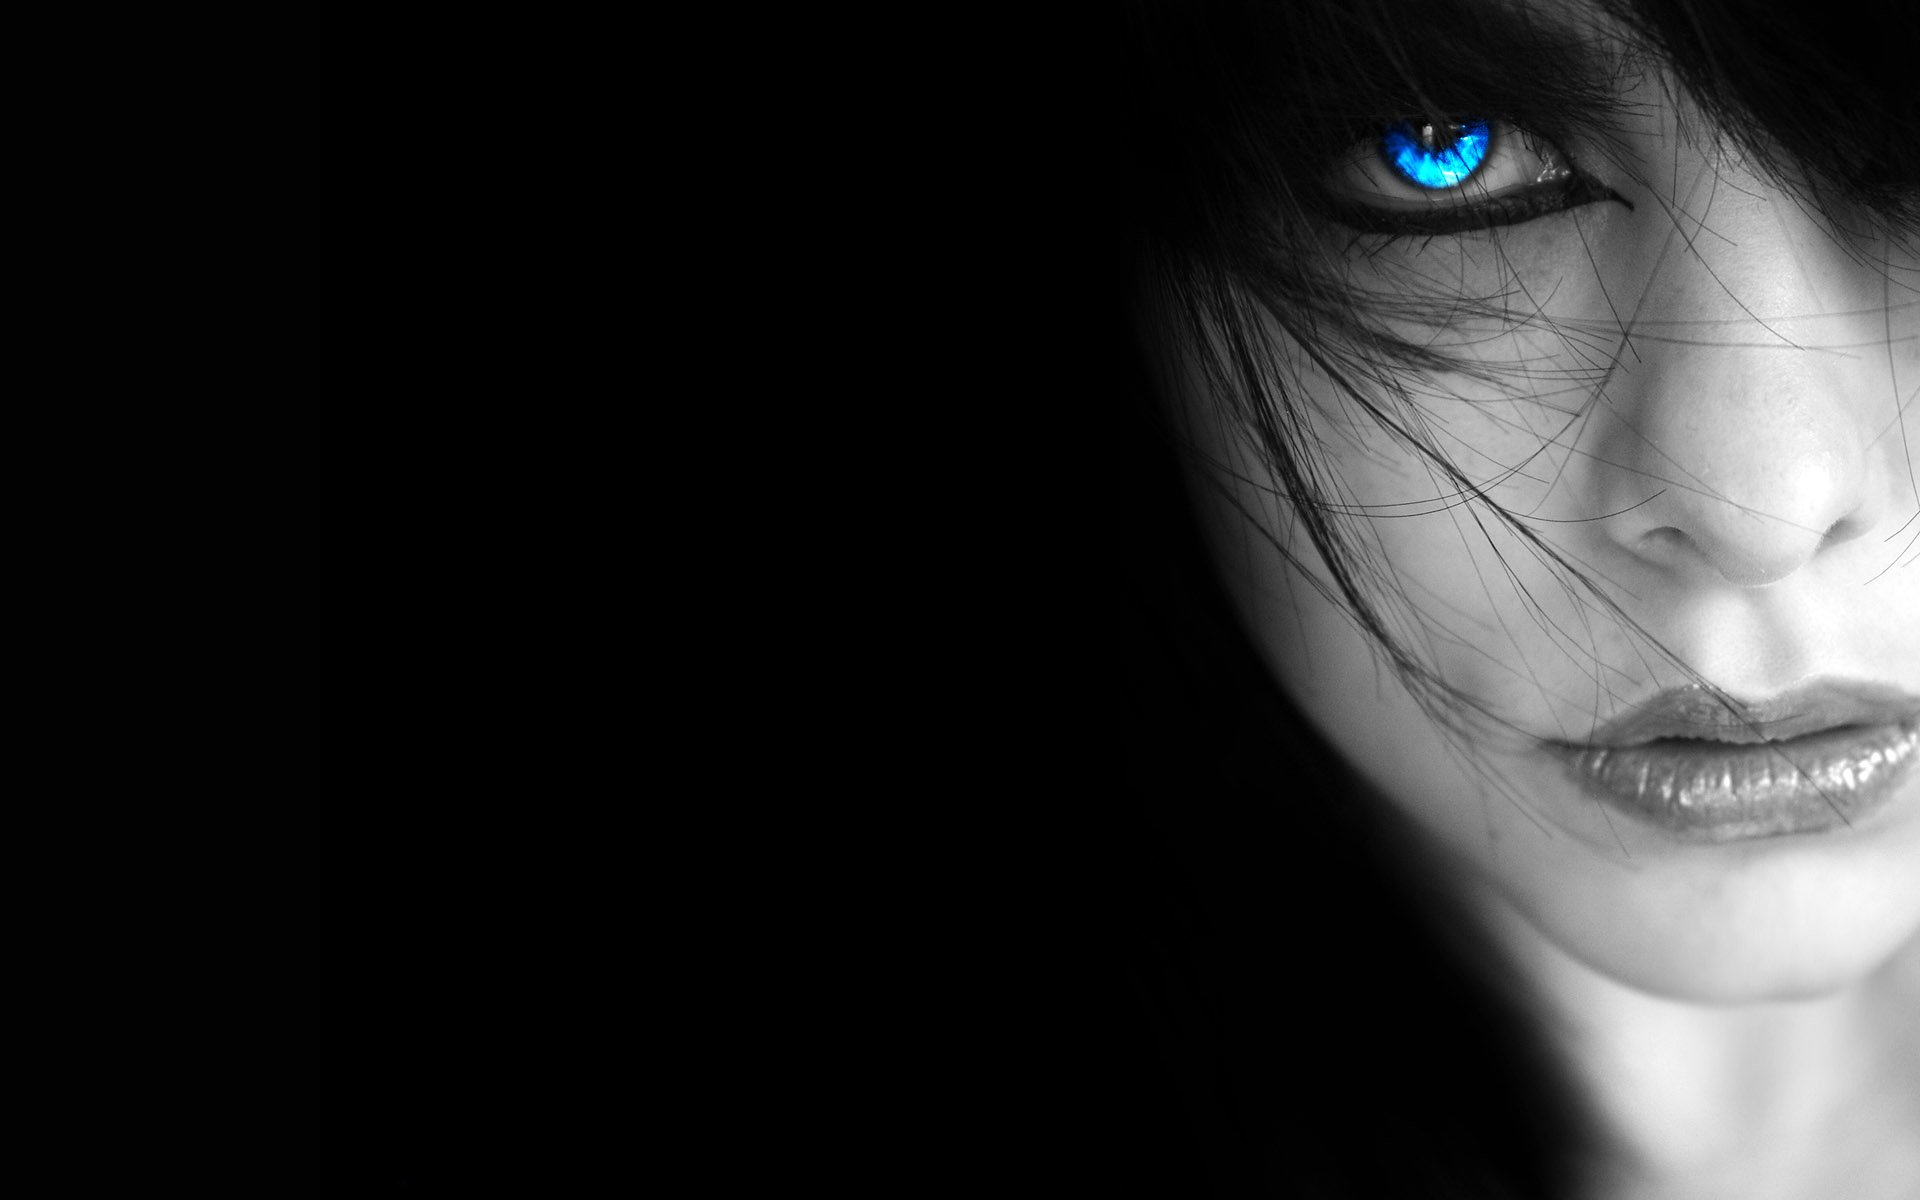 Women - Mysterious  Blue Eyes Gothic Dark Wallpaper